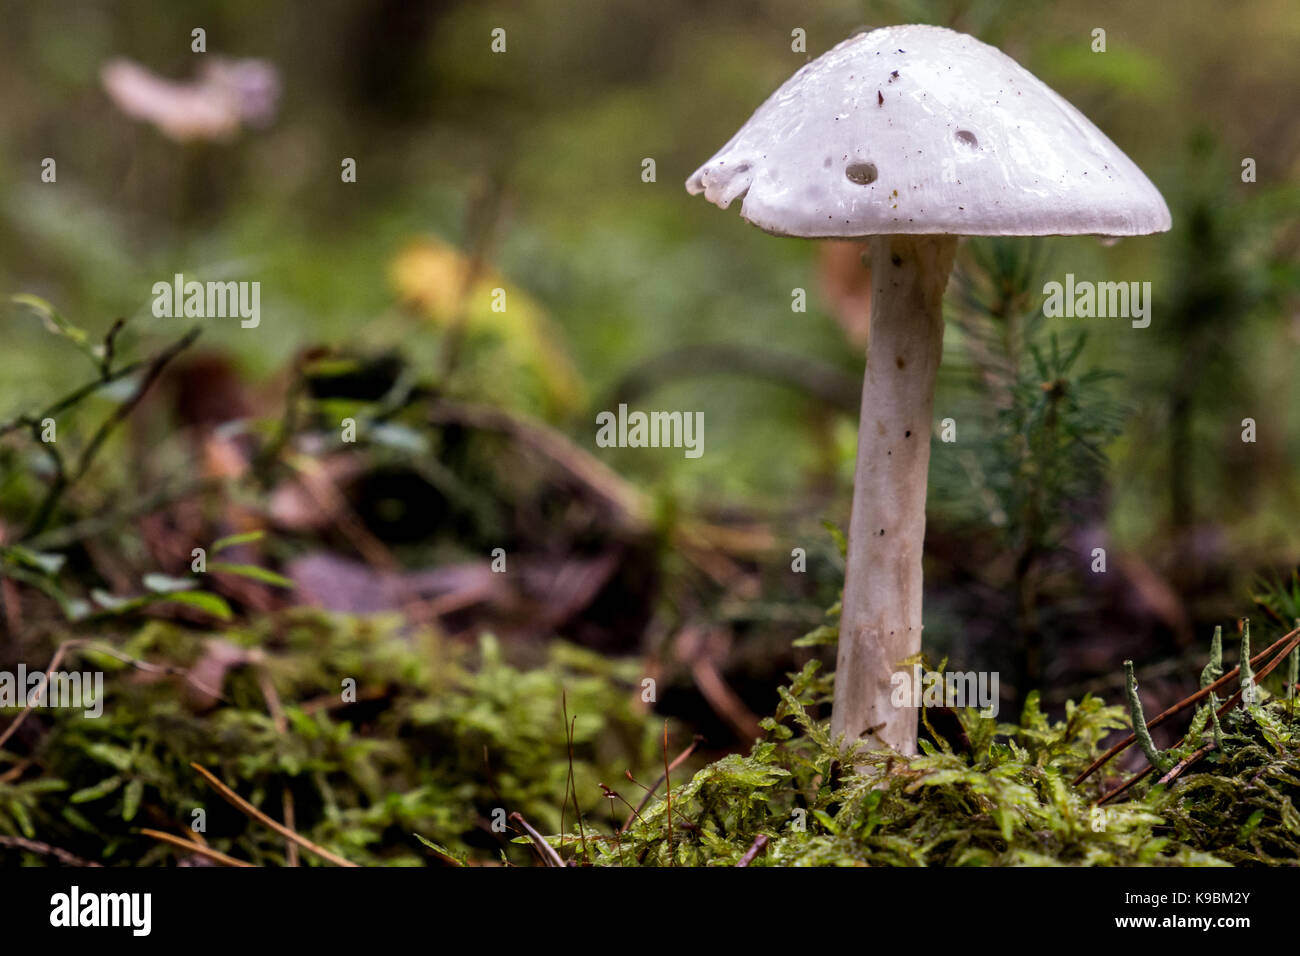 Amanita virosa shot from parallel level in landscape - Stock Image